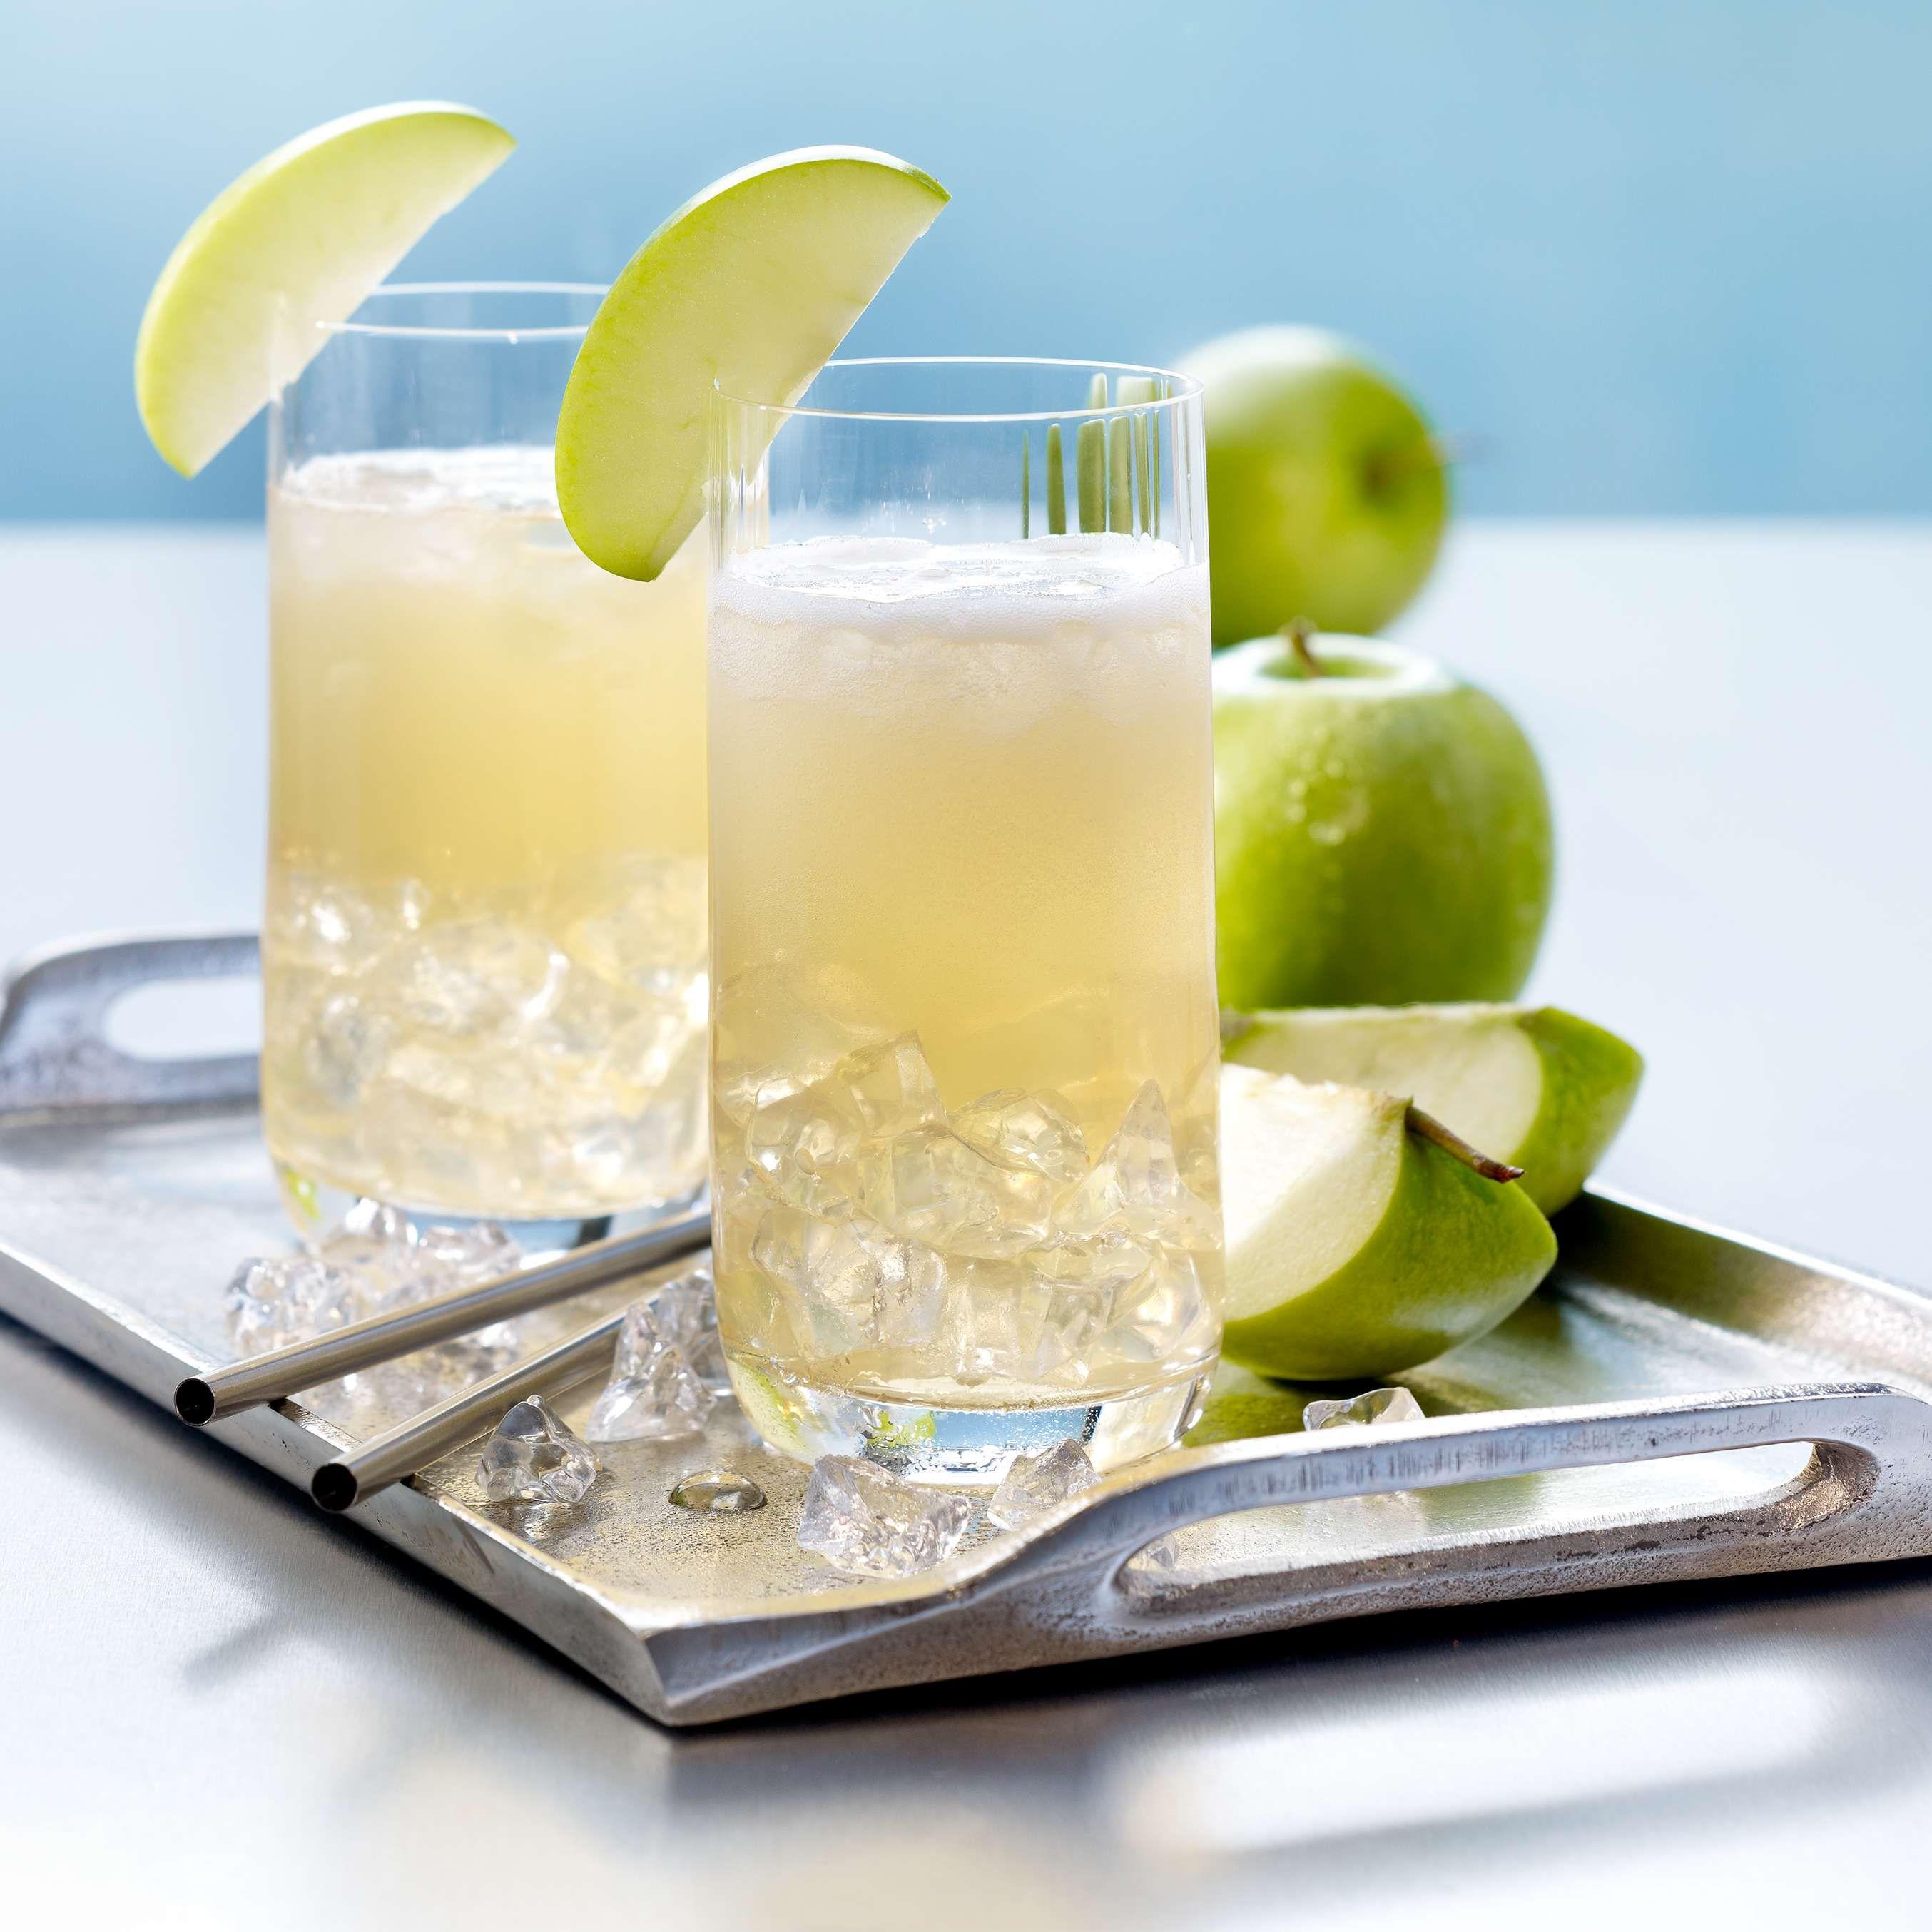 Apfel-Secco | Rezept | Getränke, Cocktails und Cocktail rezepte